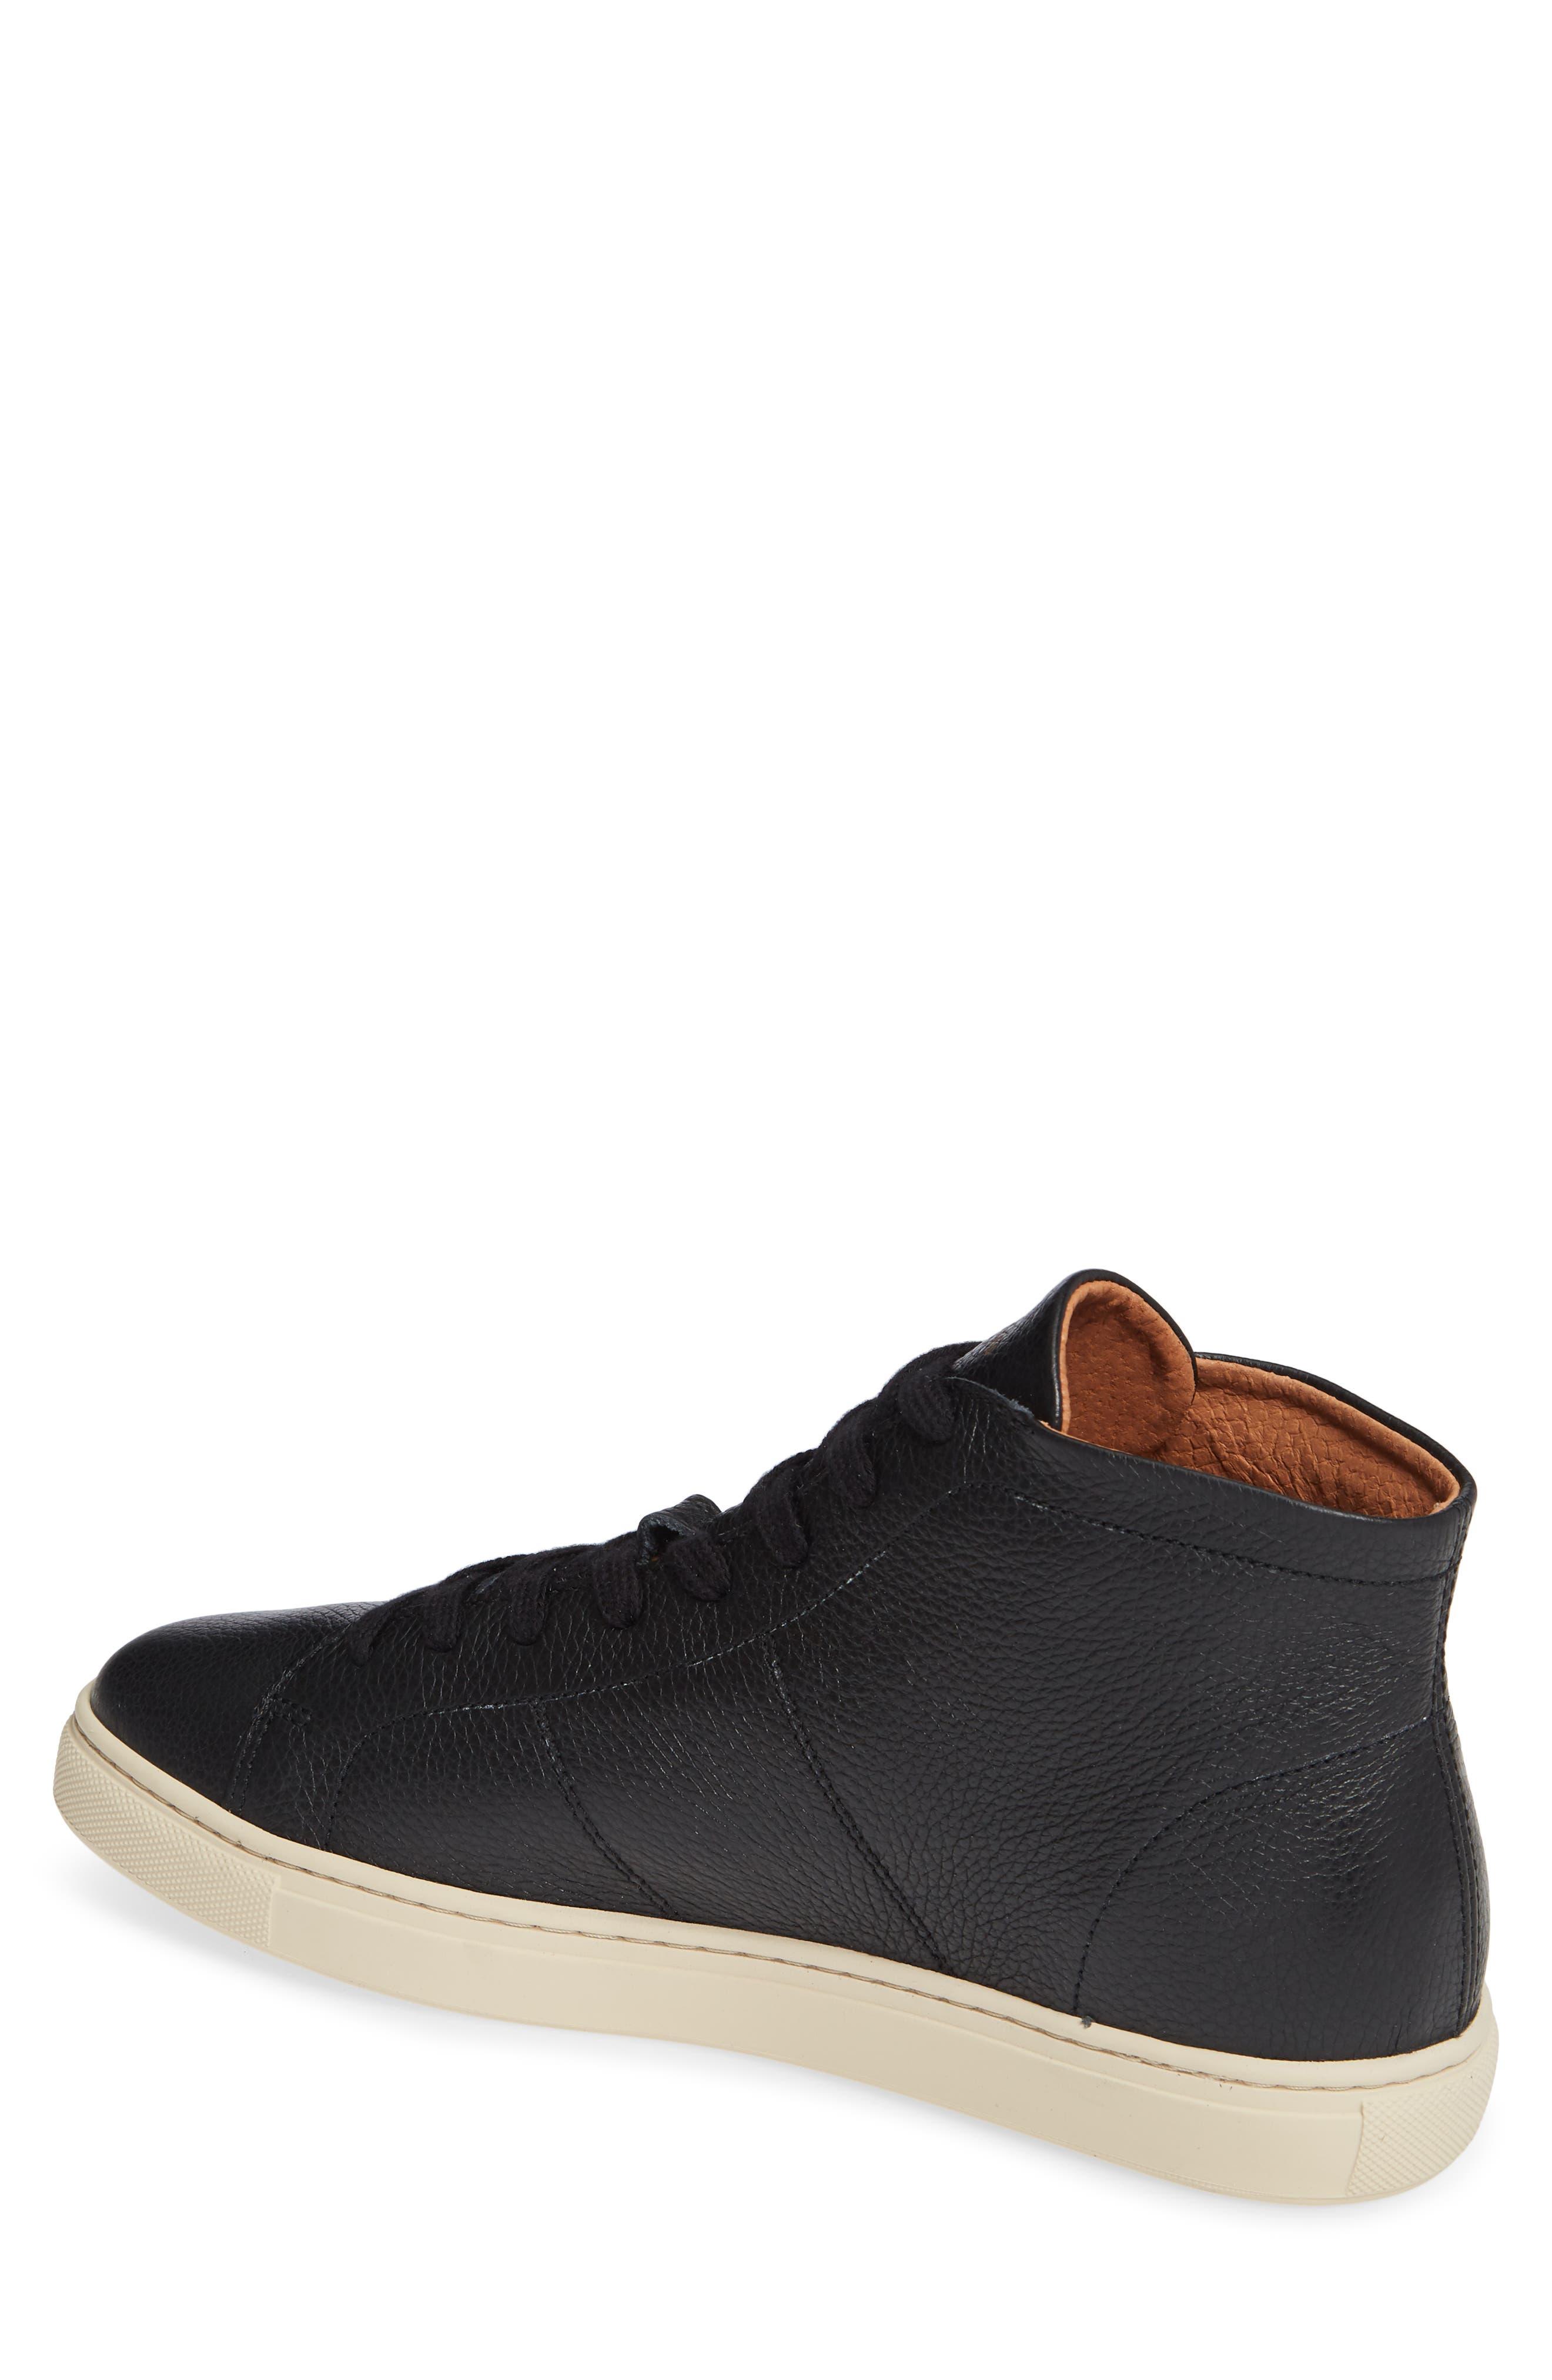 David Sneaker,                             Alternate thumbnail 2, color,                             BLACK